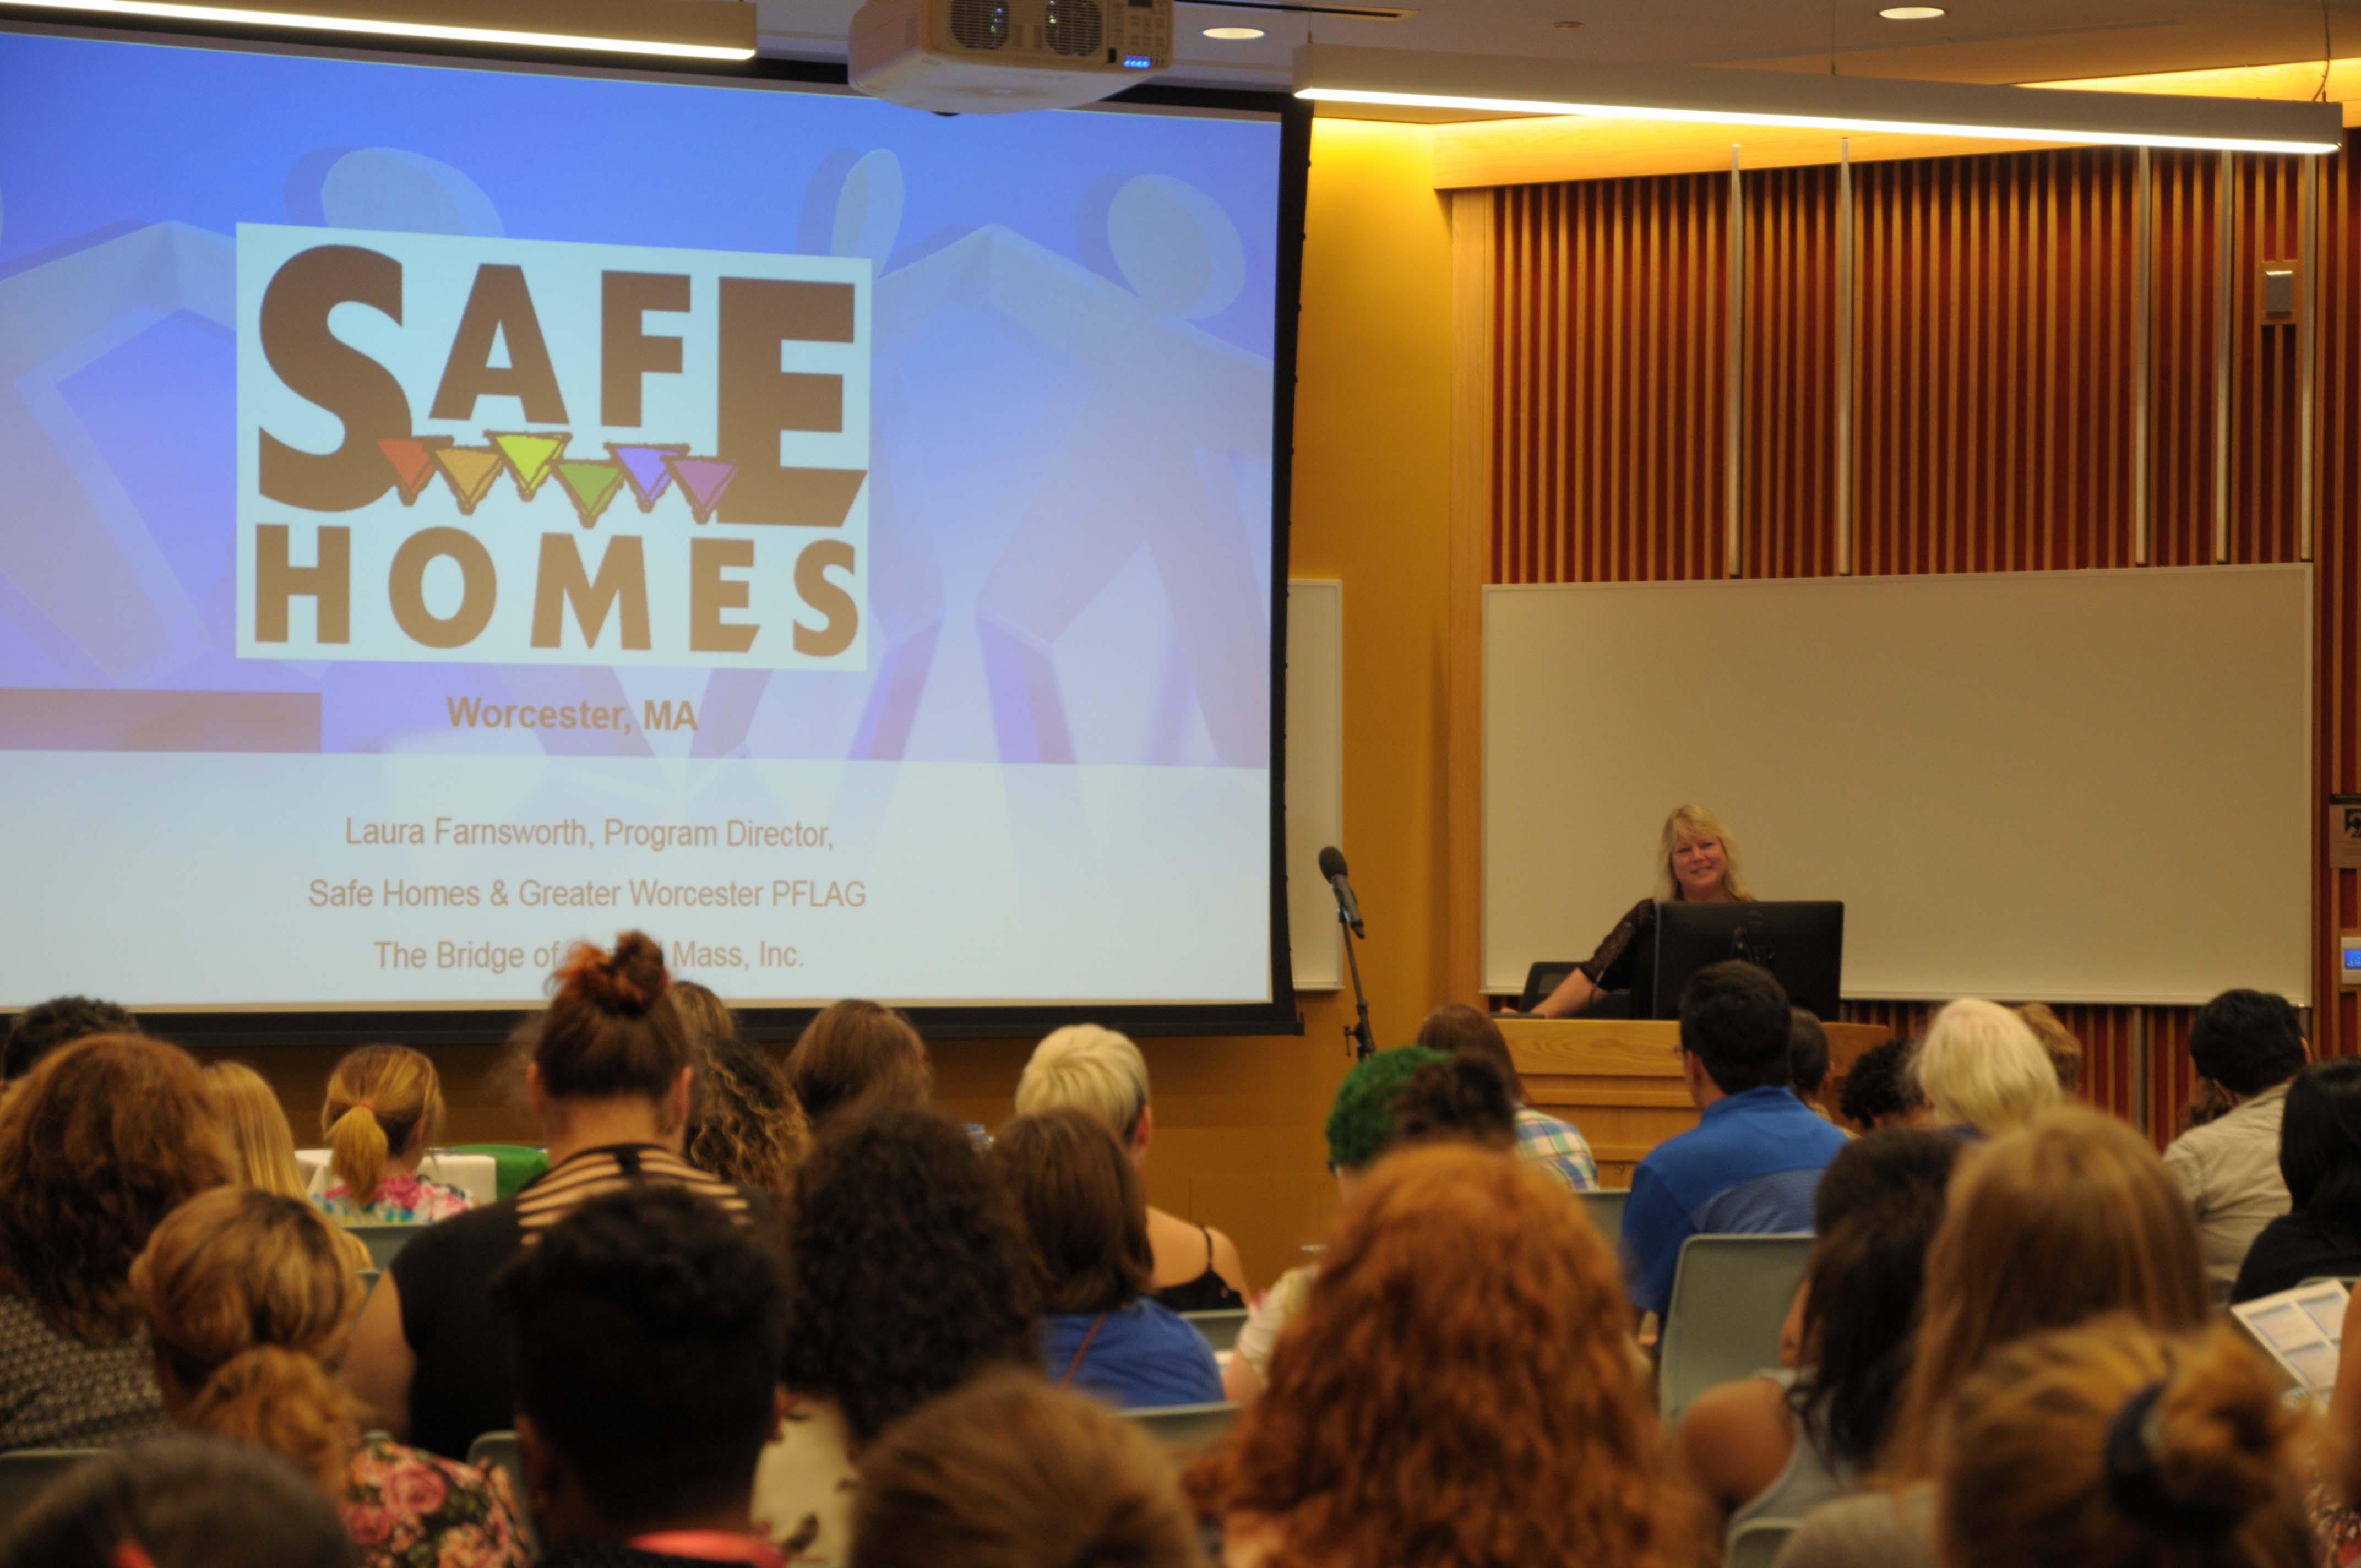 MWCC Tea Time Speaker Series Keynote Speaker Laura Farnsworth